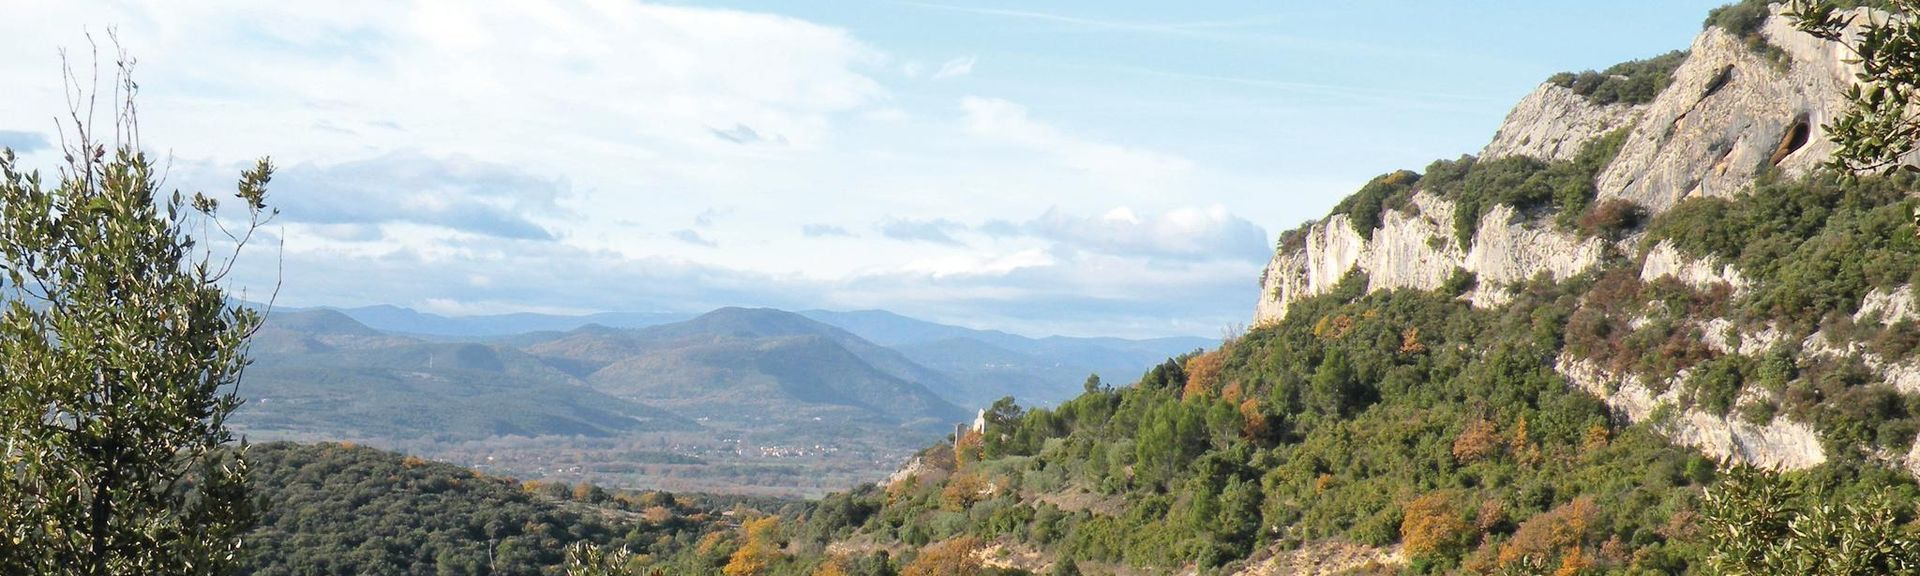 Ales, Gard, France